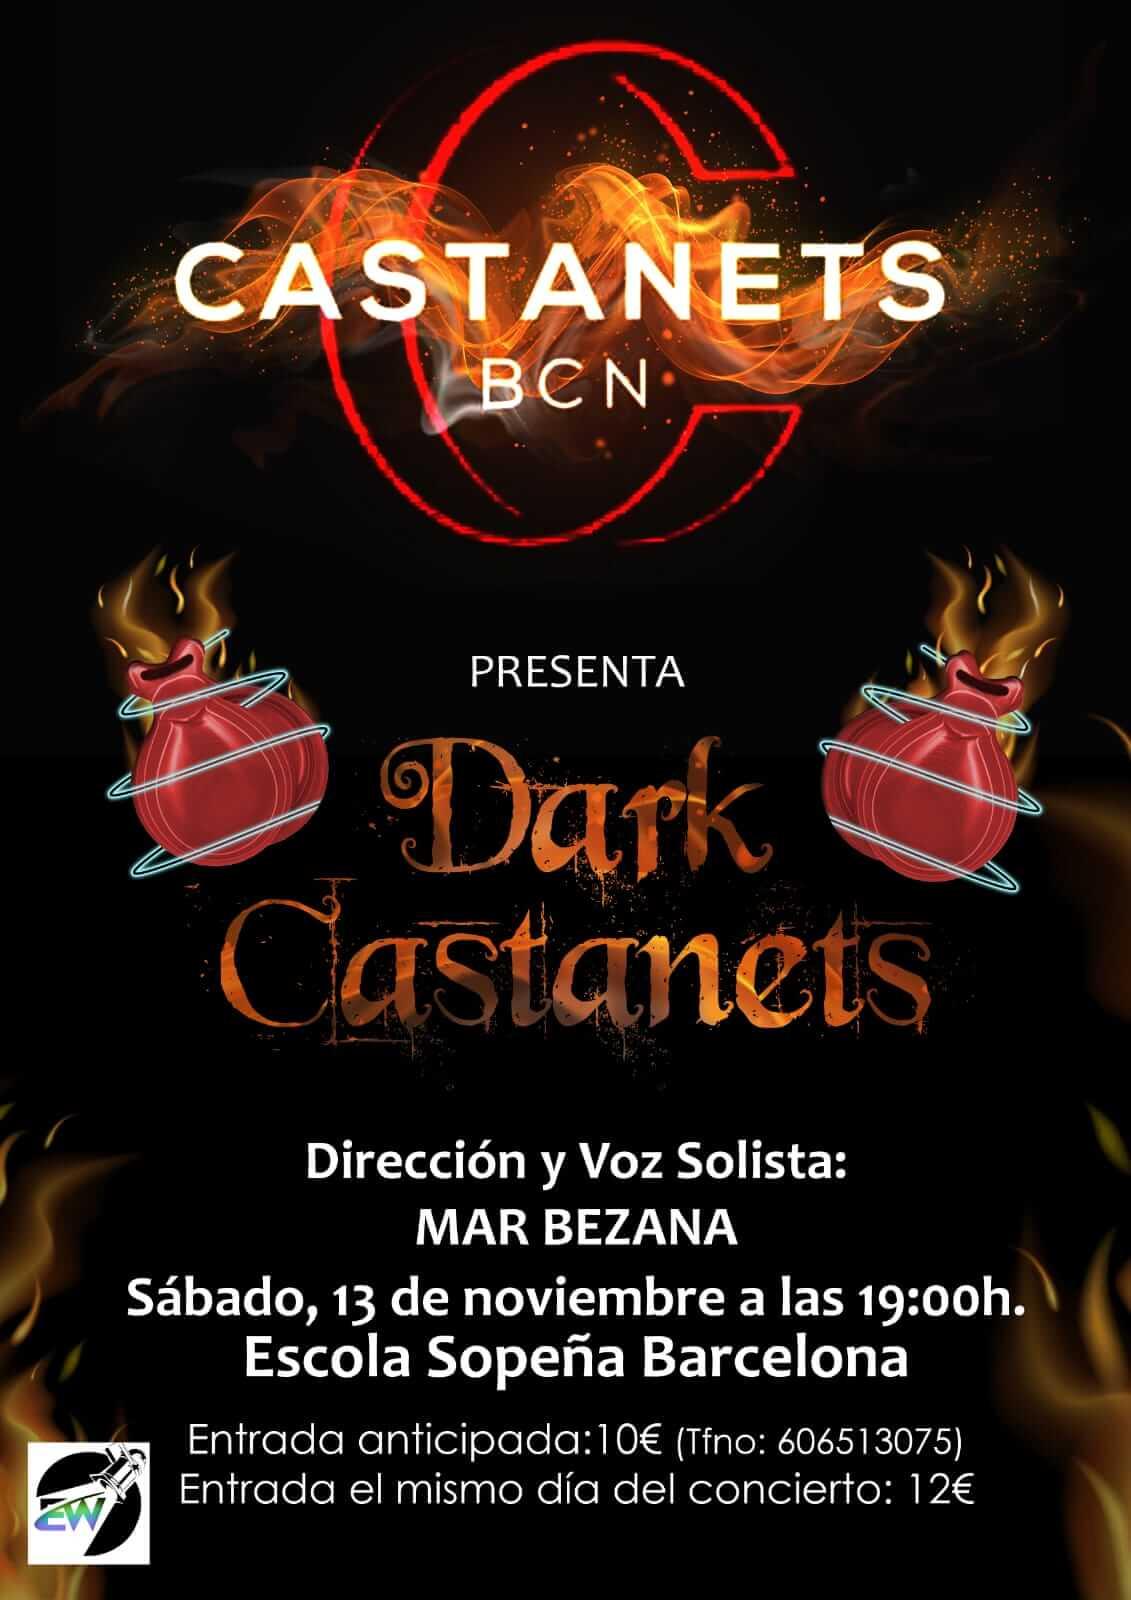 CASTANETS BCN en Barcelona